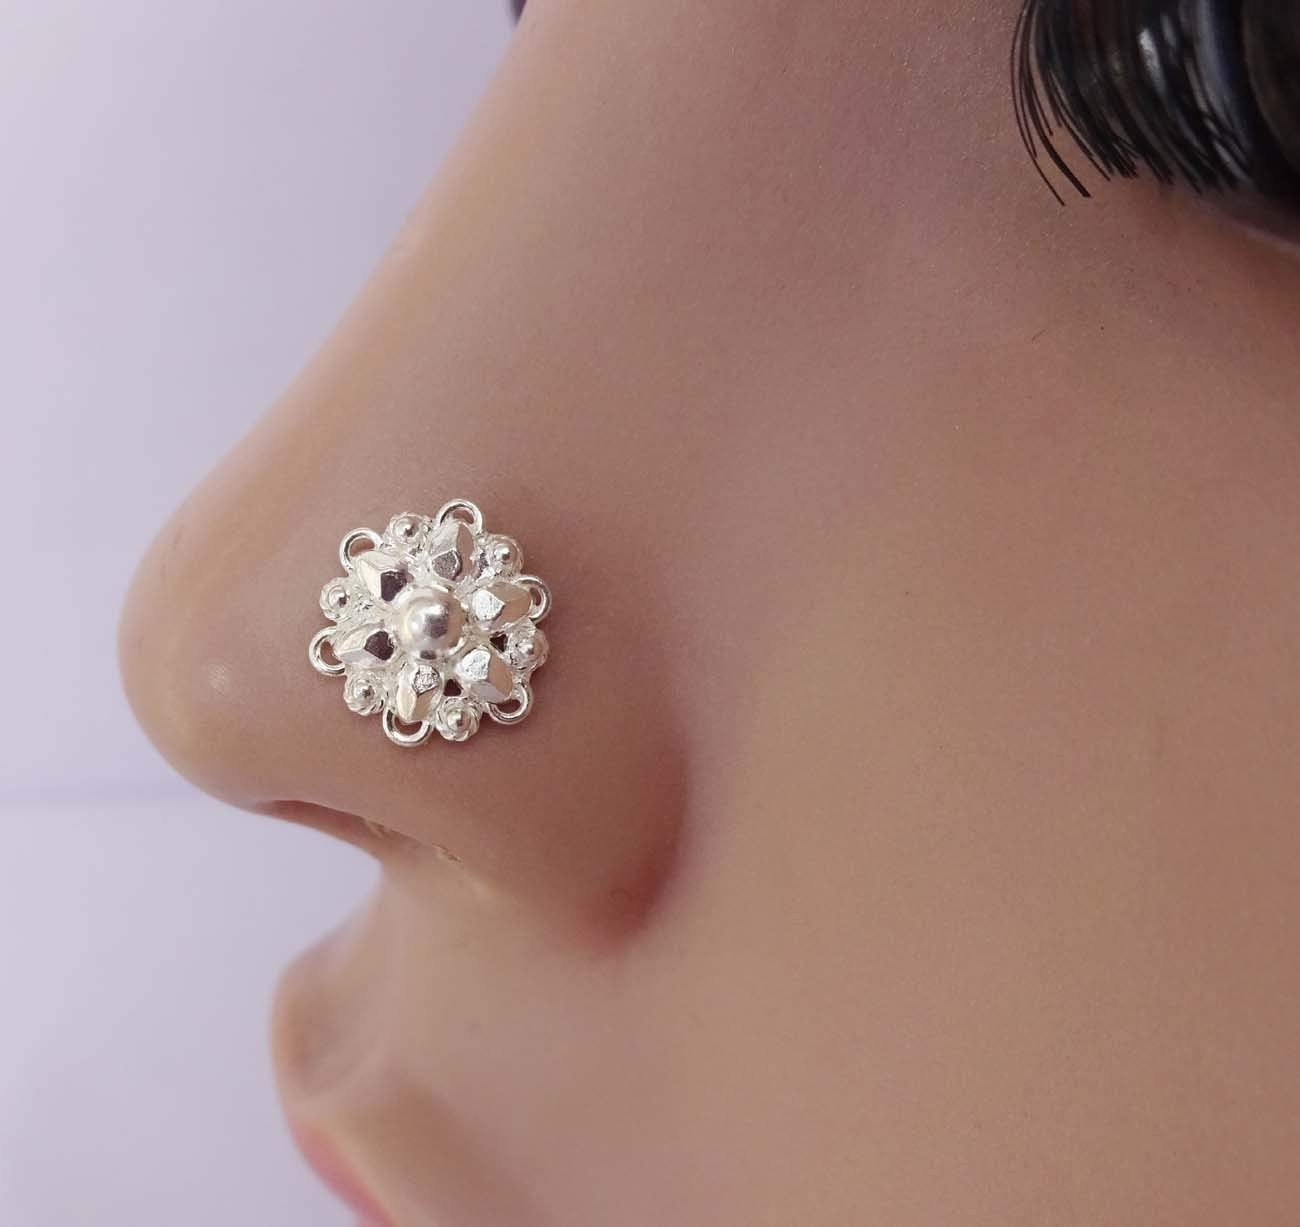 Cheap 20g Nose Stud Find 20g Nose Stud Deals On Line At Alibaba Com